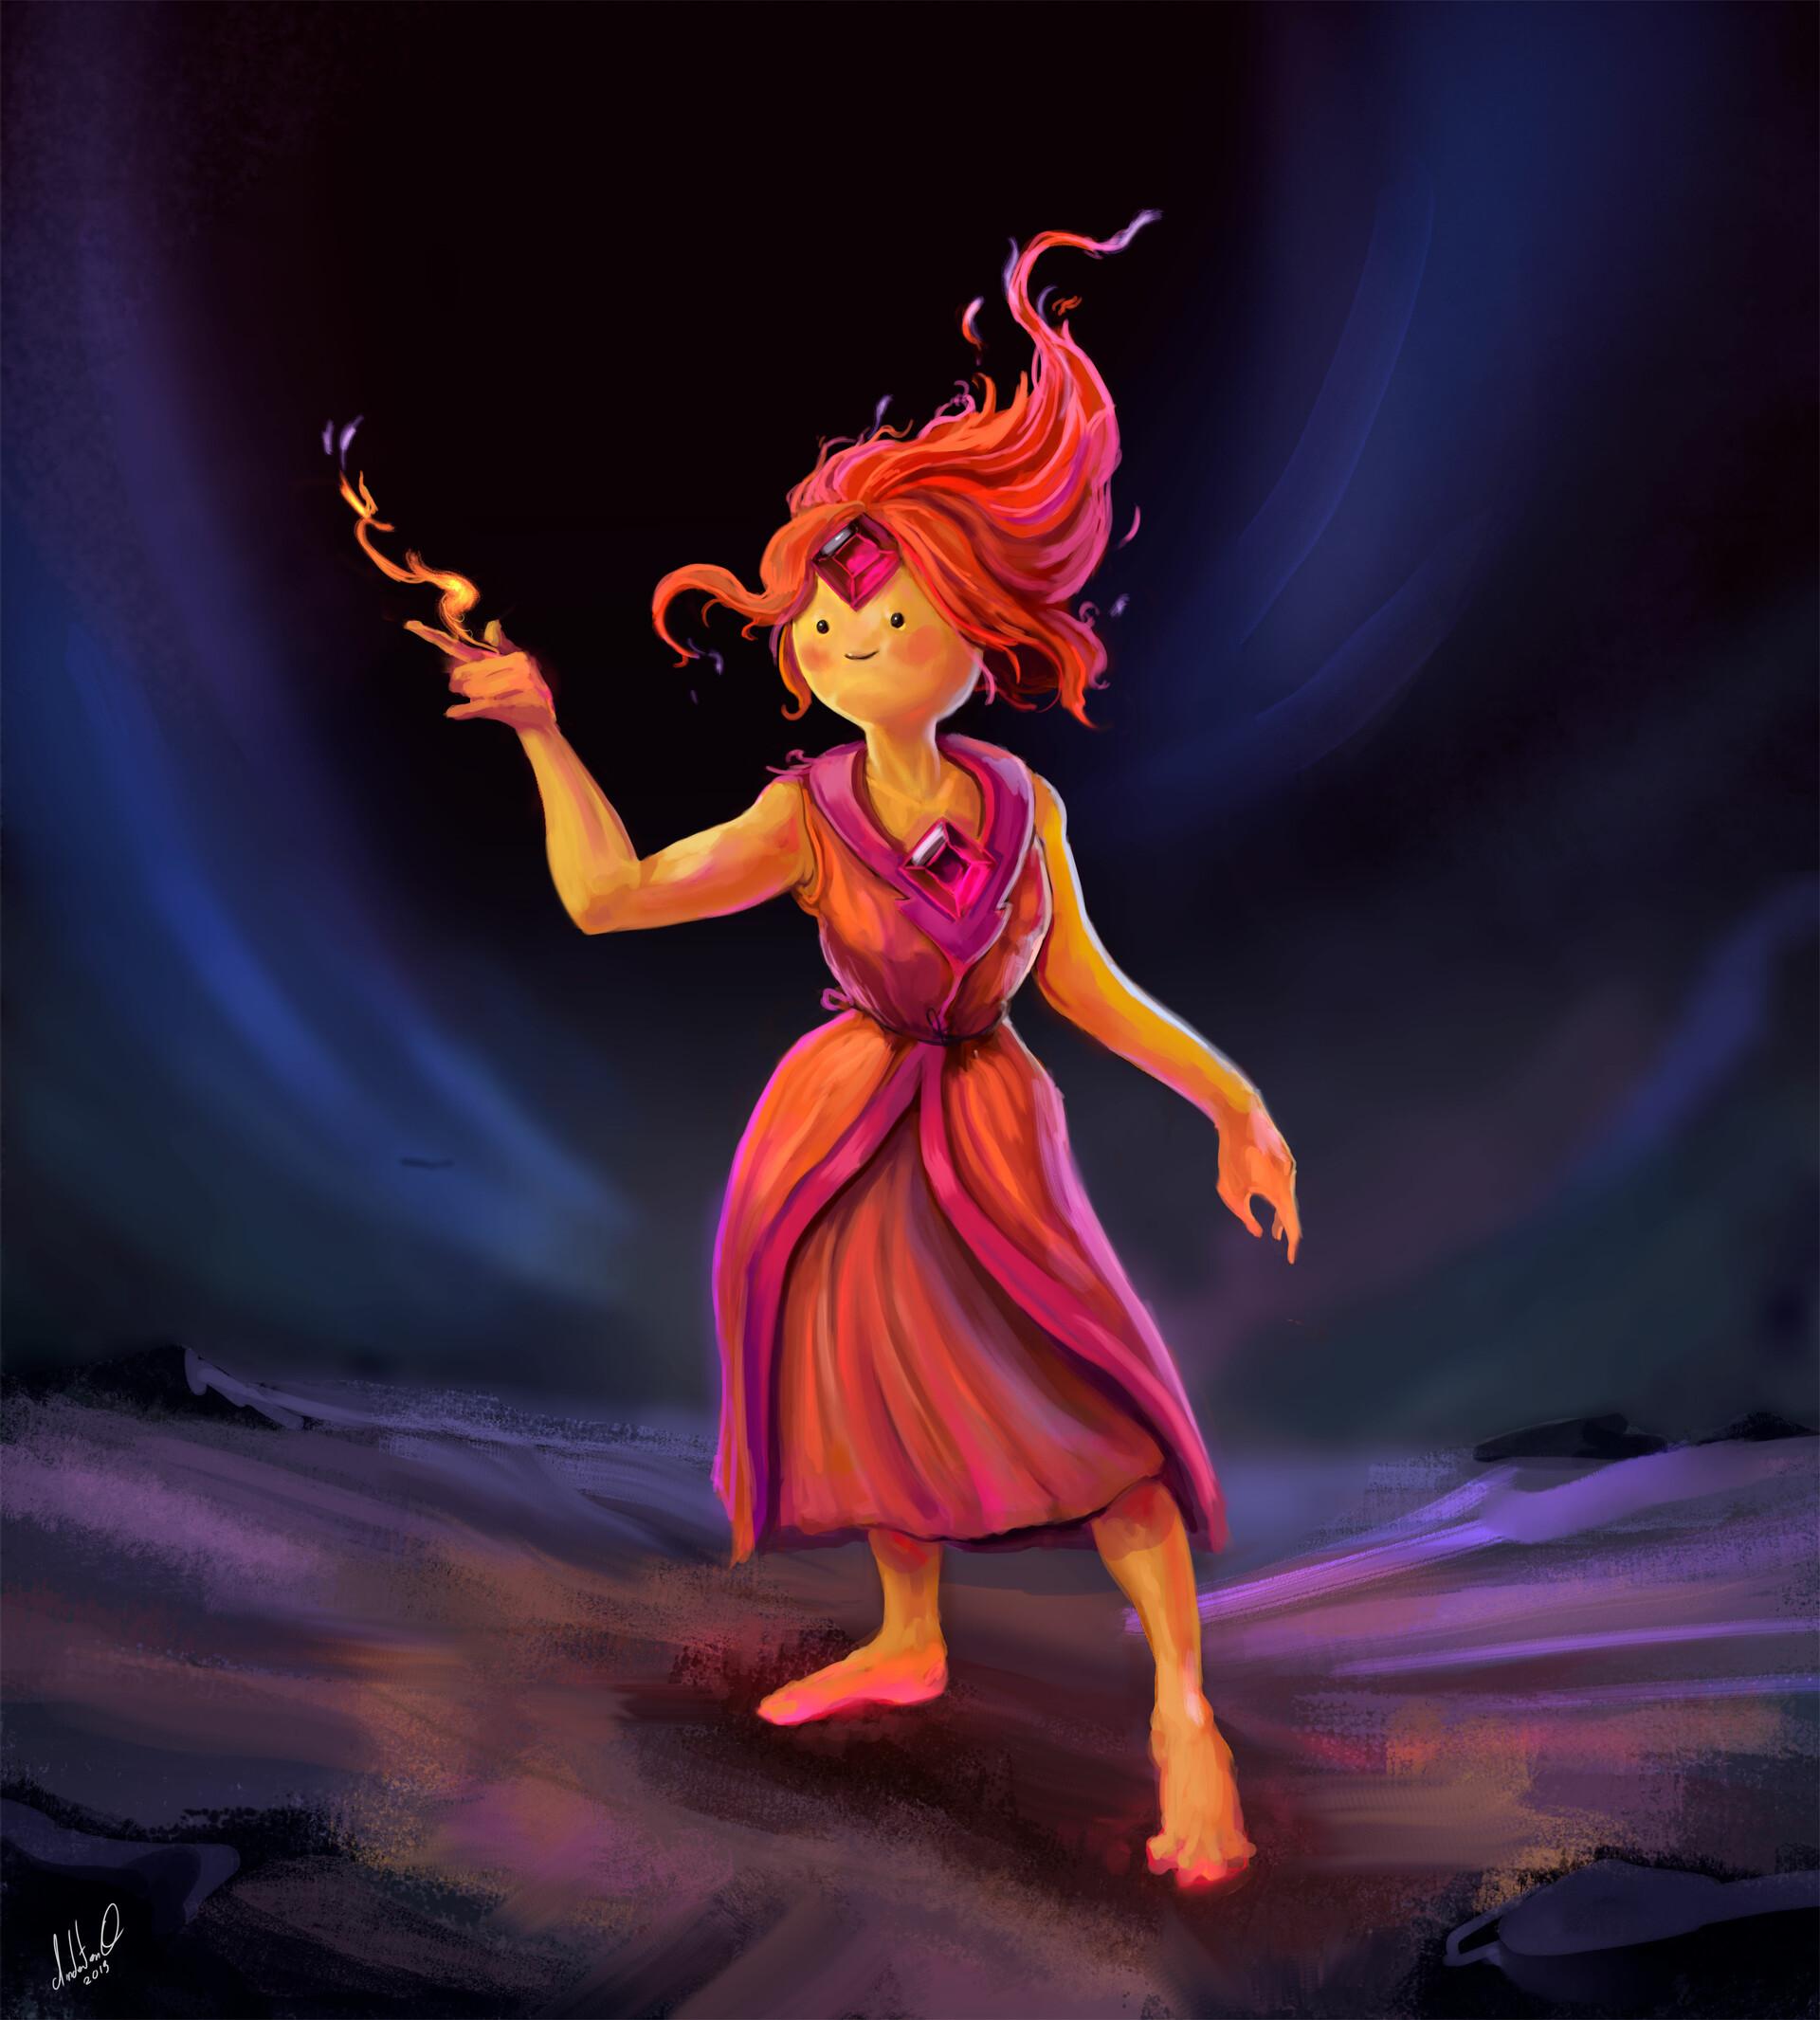 Anderton oliveira 231 princesa de fogo j